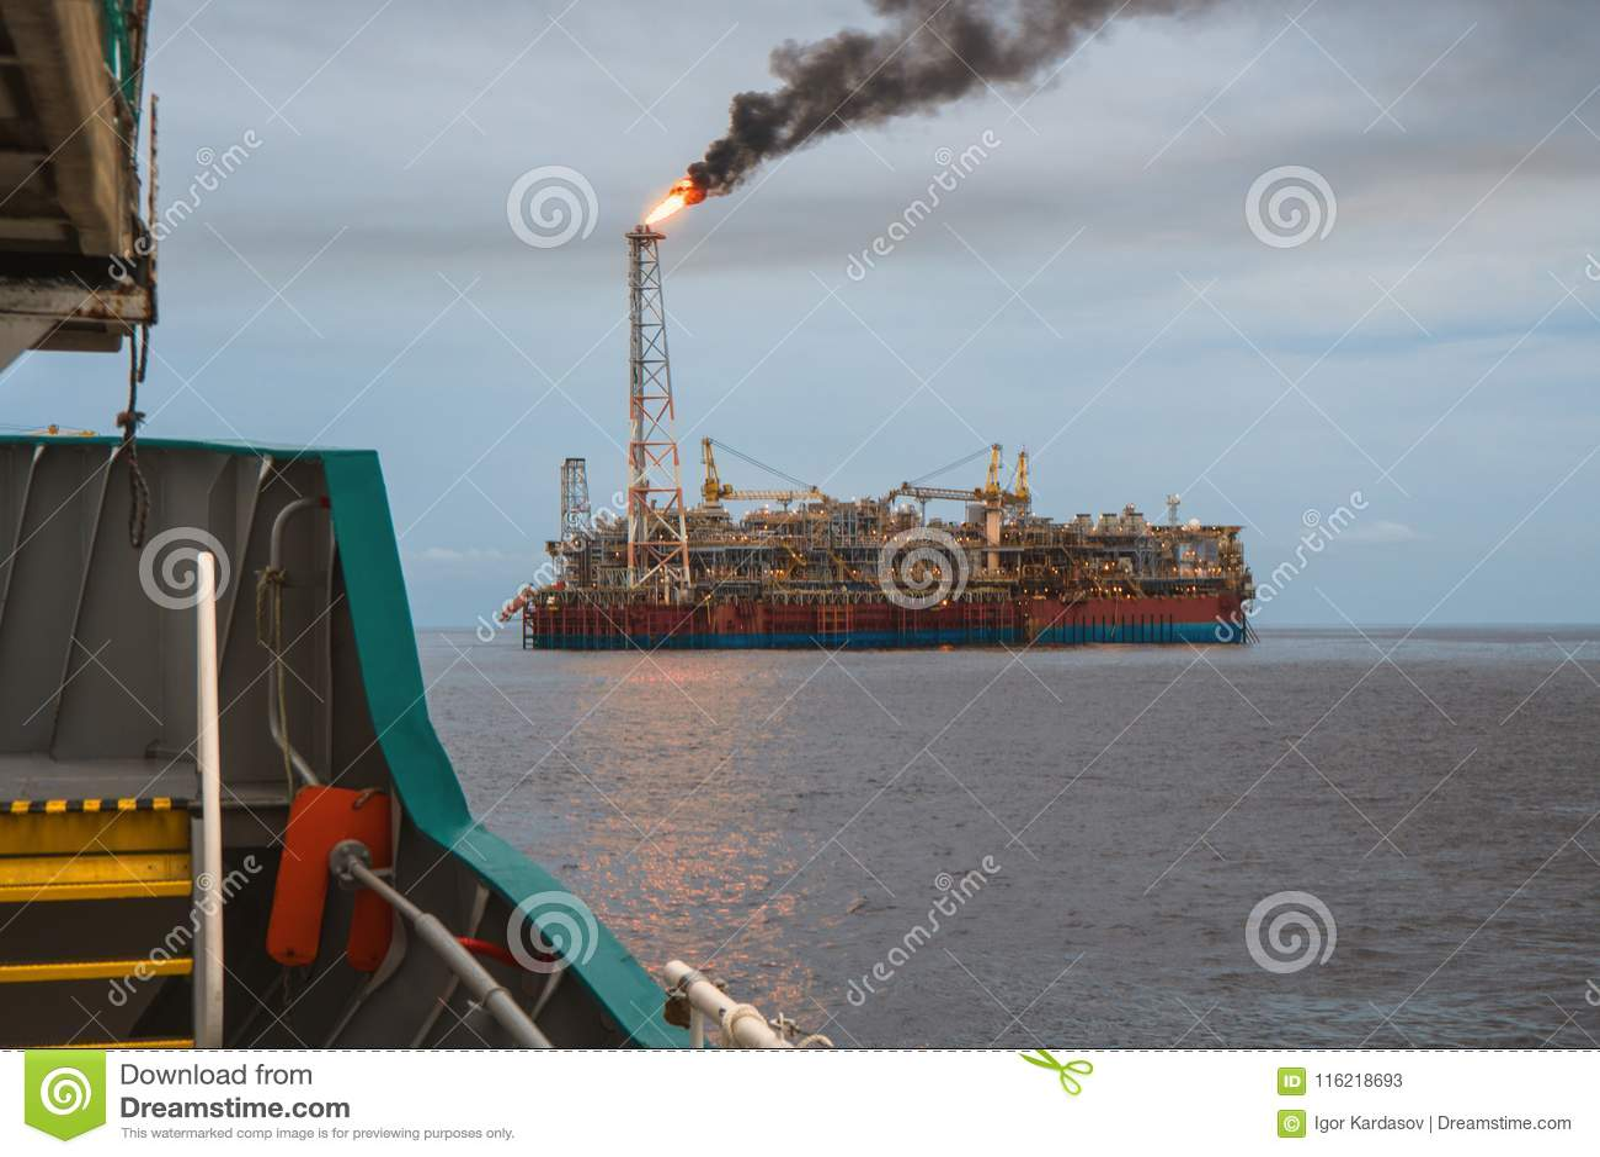 FPSO Tanker Vessel Near Oil Rig Platform  Offshore Oil And